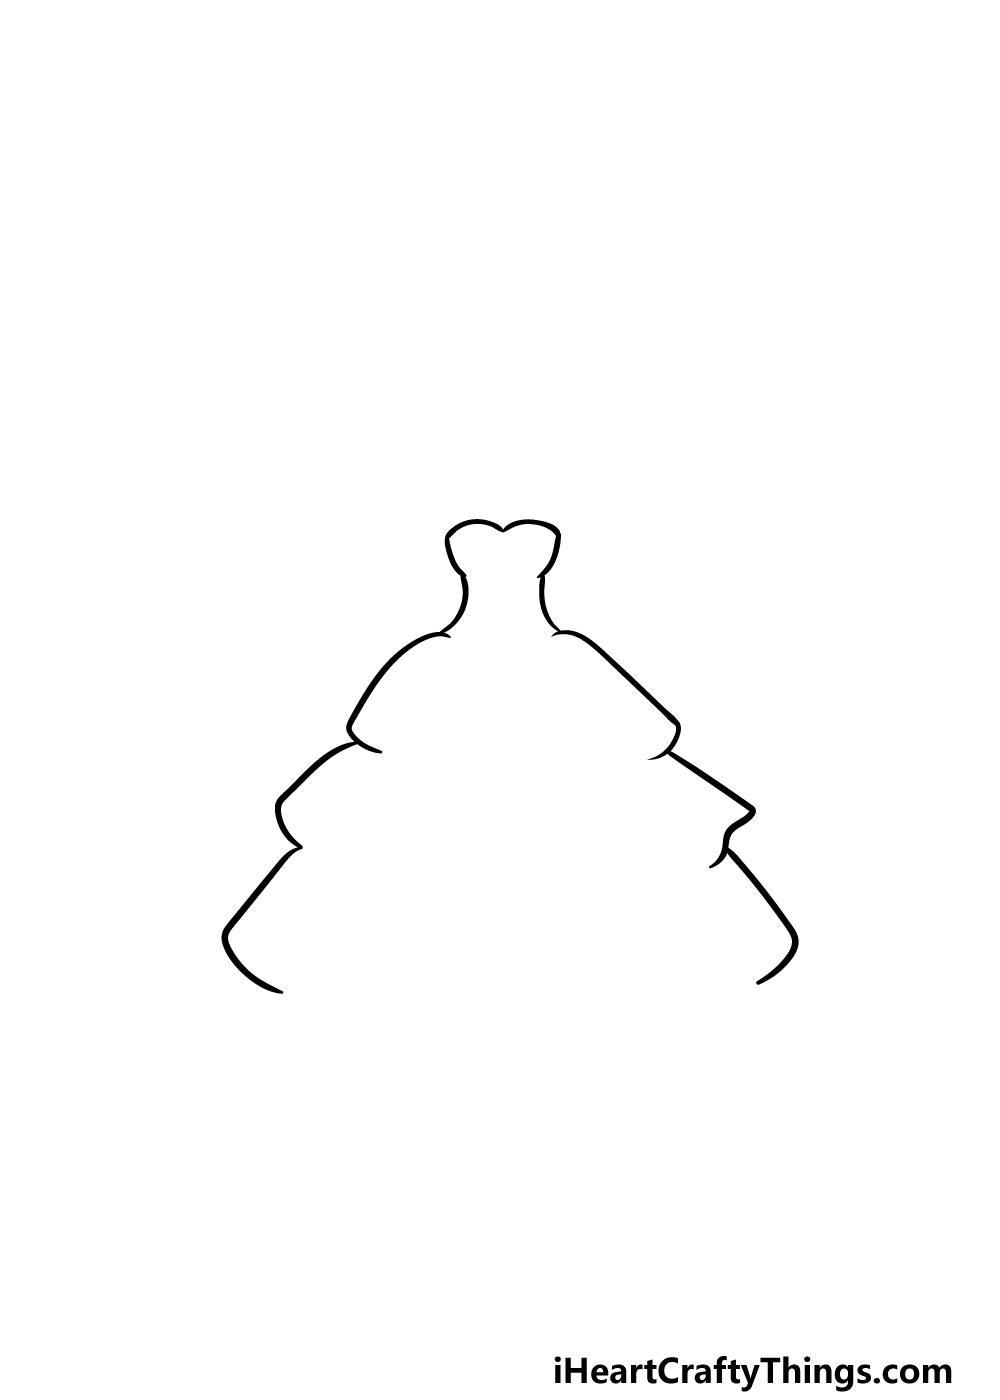 drawing ruffles step 2